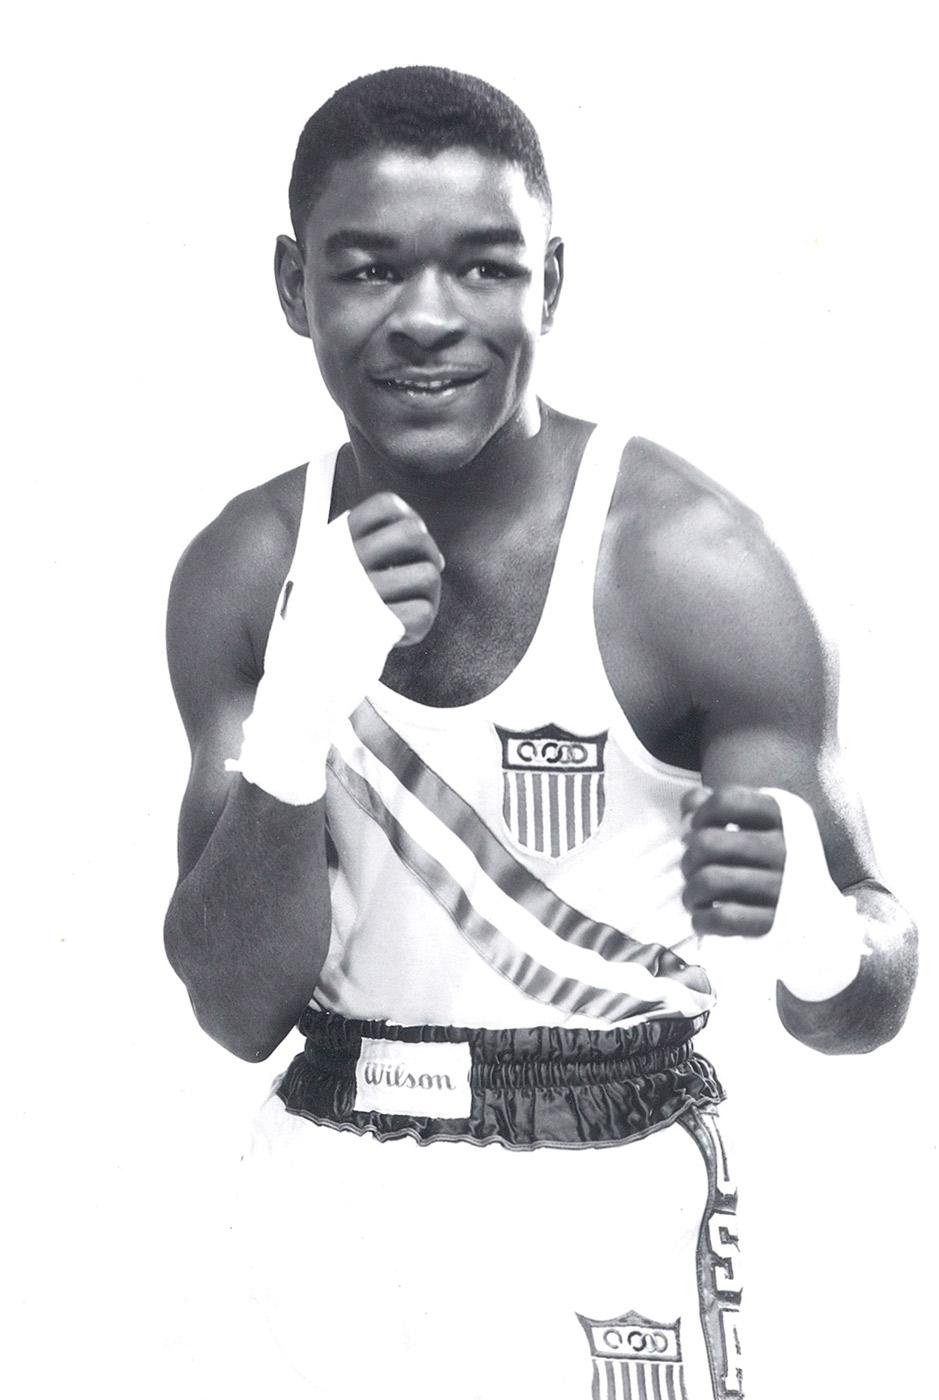 Chuck Adkins, Boxing, 1952 Olympics